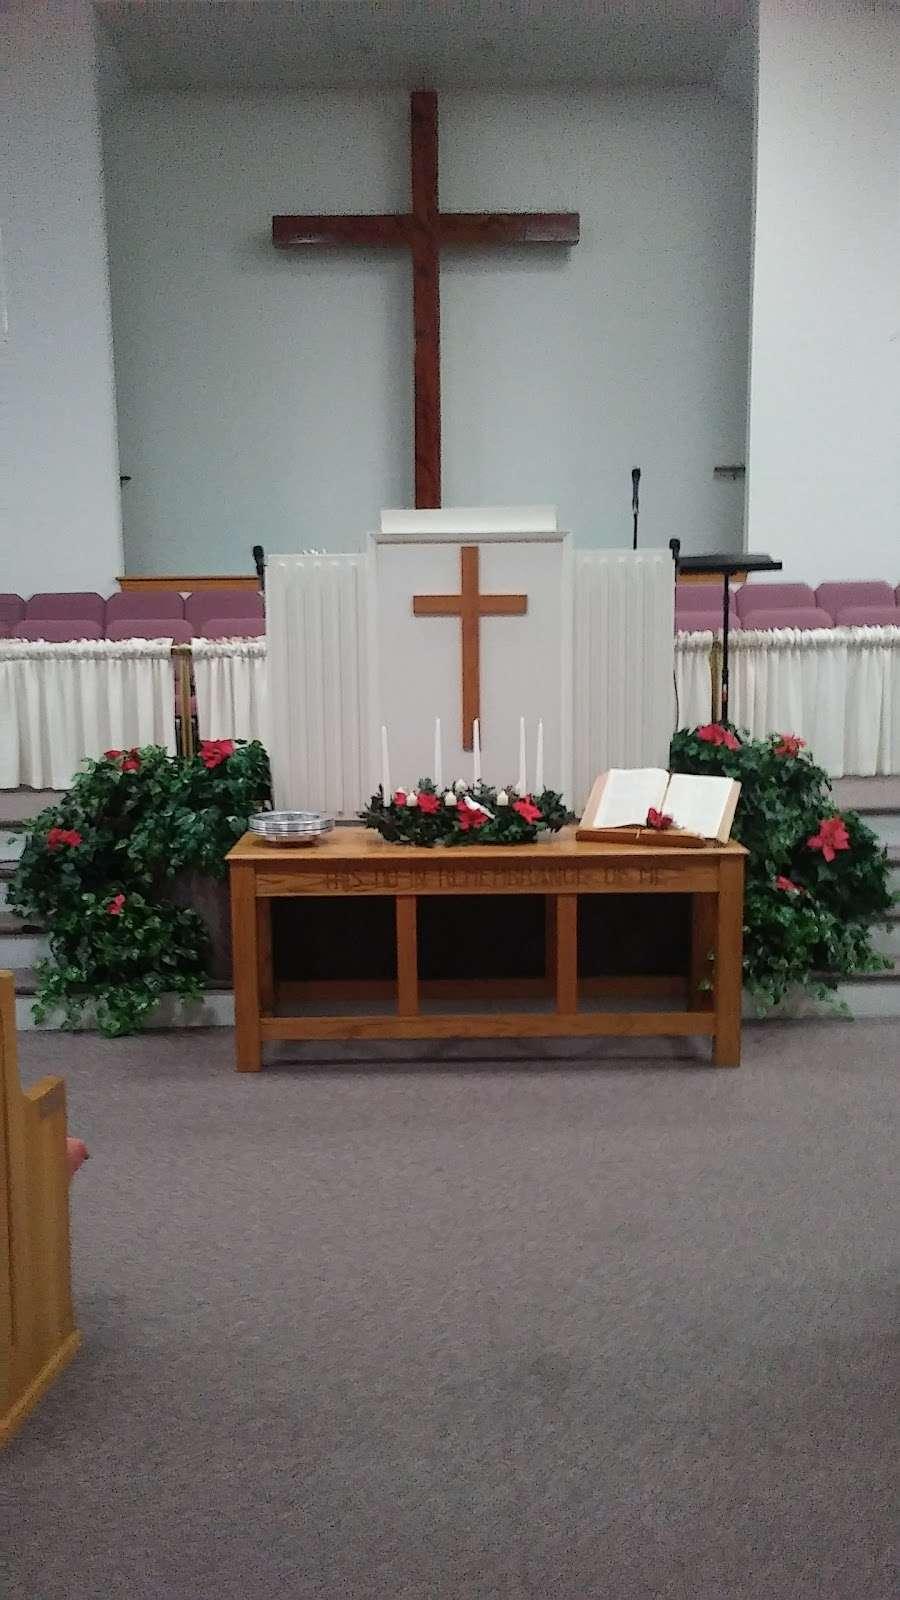 Open Book Baptist Church - church  | Photo 1 of 1 | Address: 2850 Old Charlotte Hwy, Monroe, NC 28110, USA | Phone: (704) 292-7633